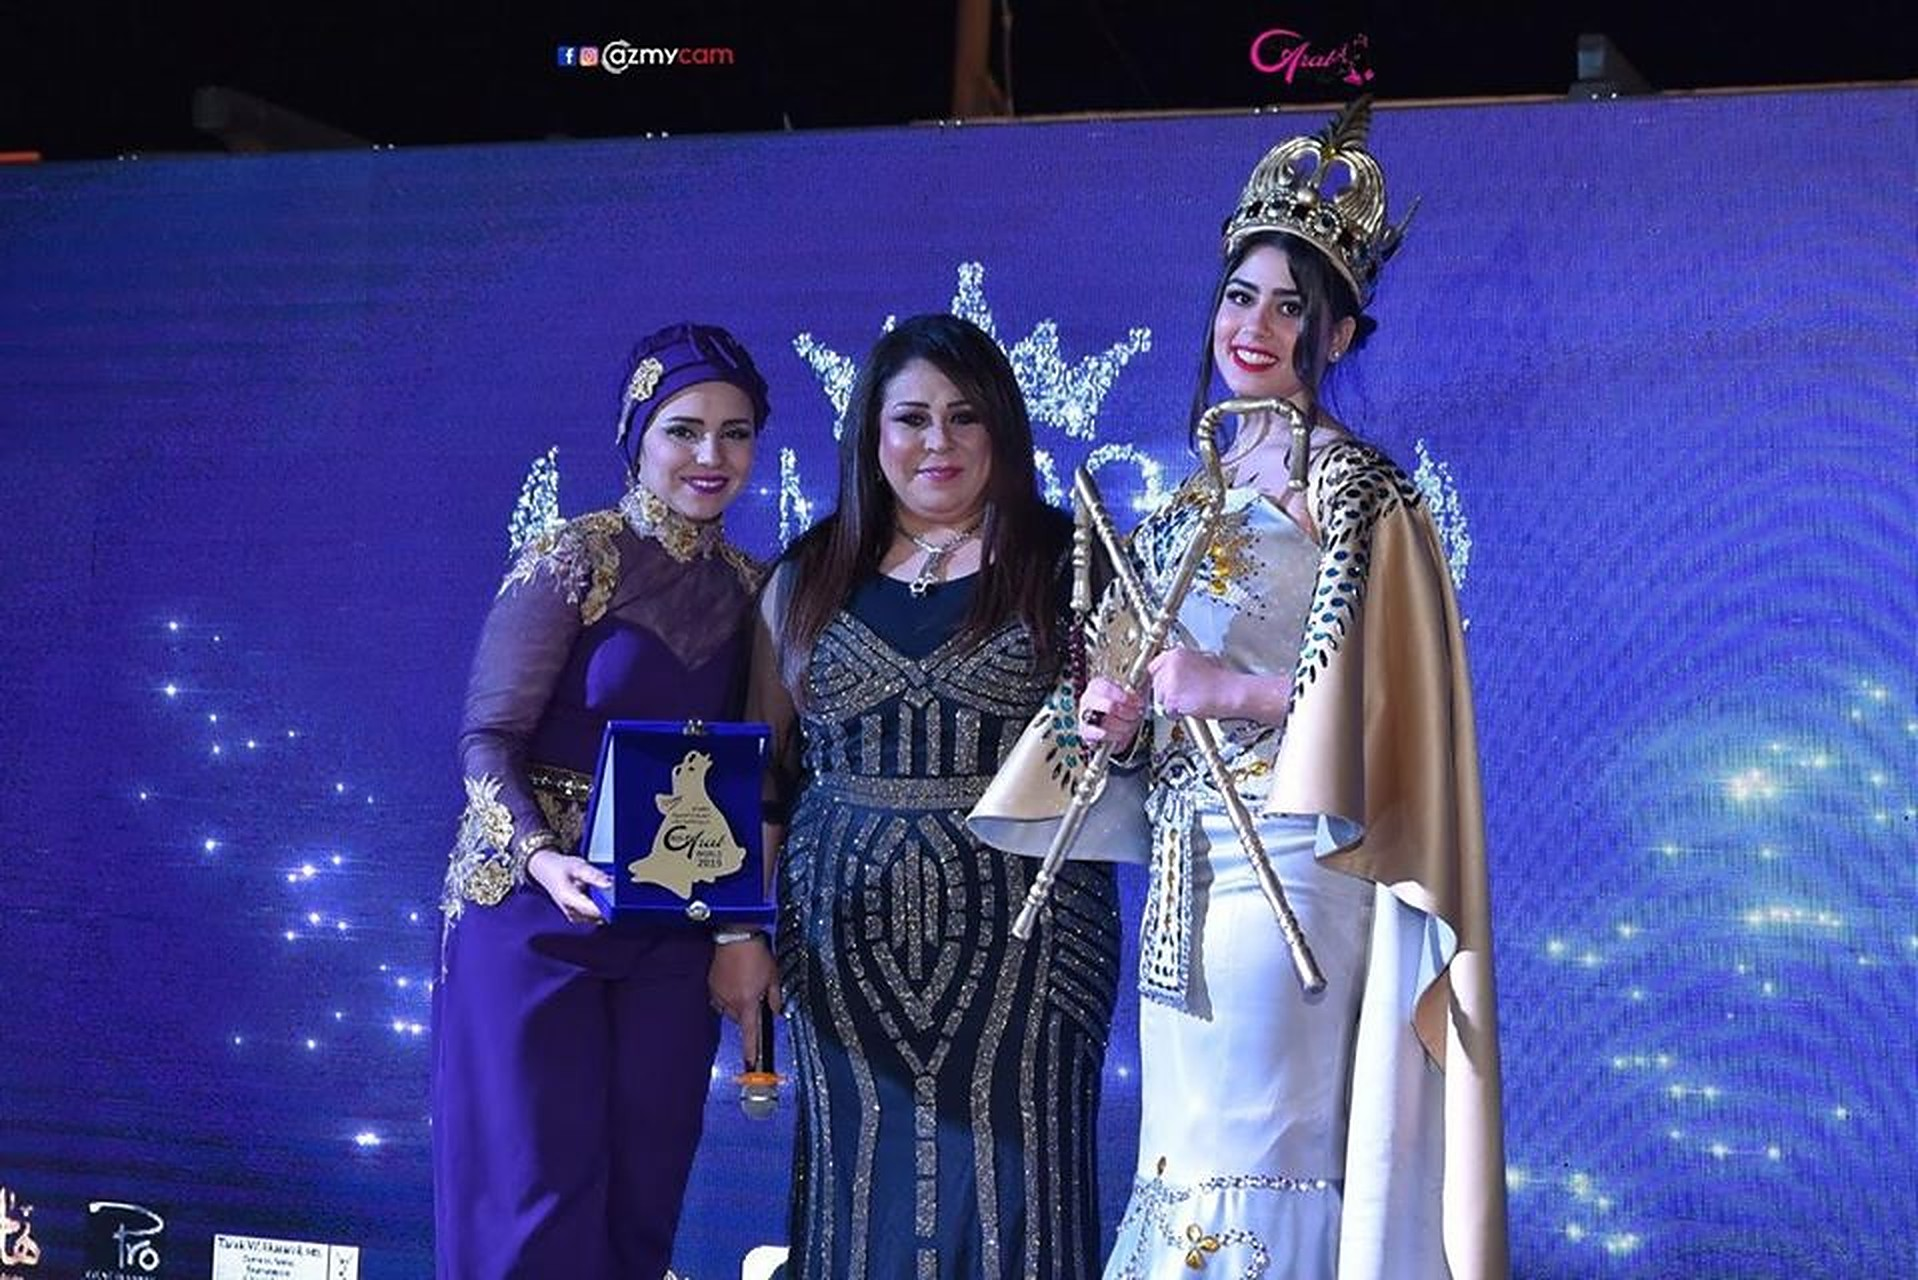 In Upper Egypt Fashion Designer Raghda Tries To Push Women To Own Their Sense Of Style Egyptian Streets